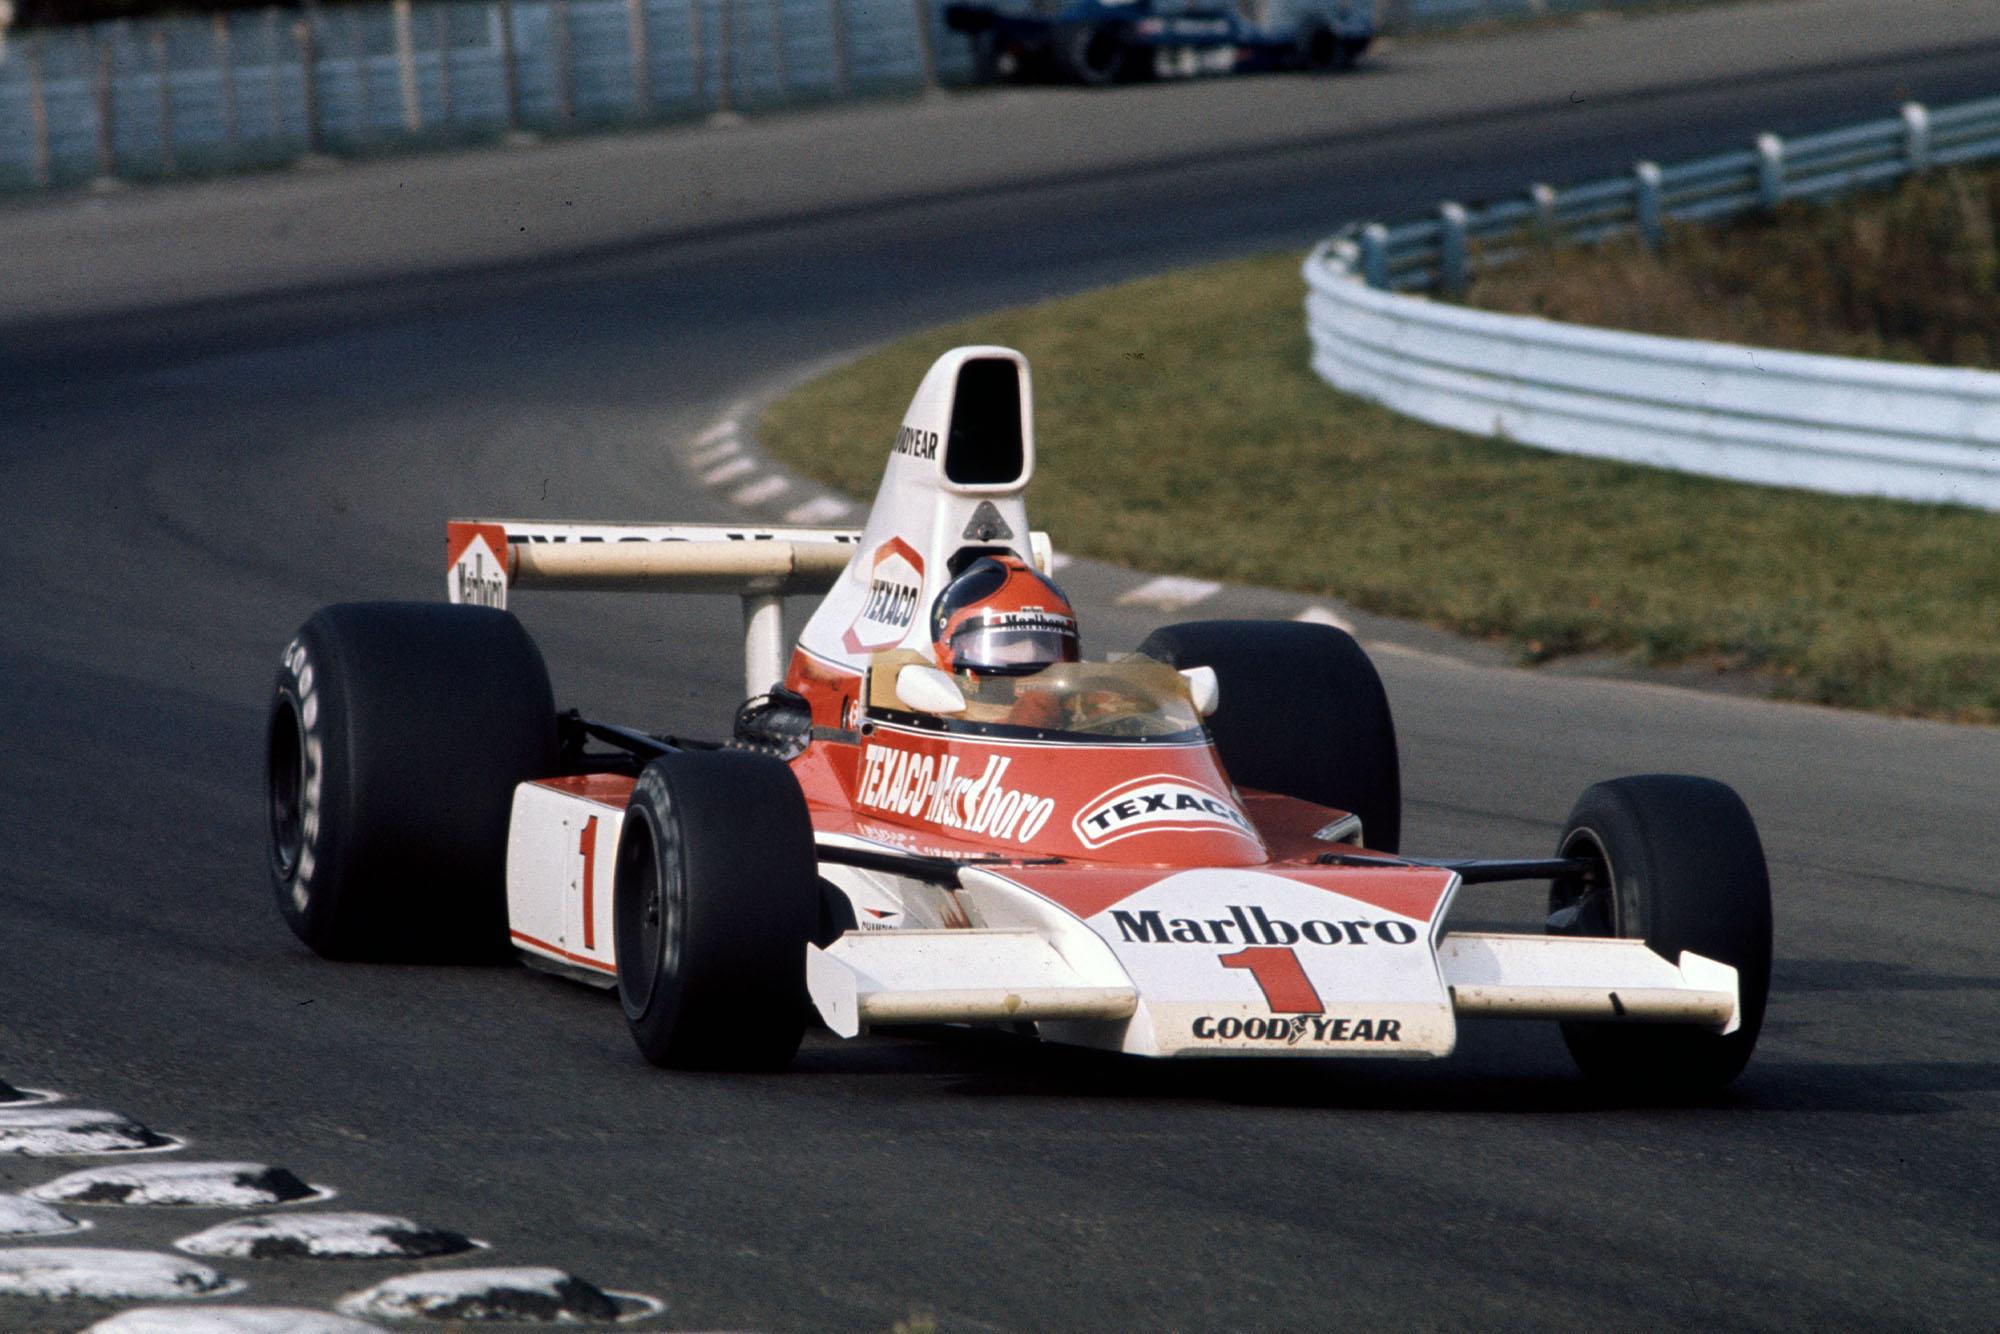 Emerson Fittipaldi (McLaren) at the 1975 United States Grand Prix, Watkins Glen.